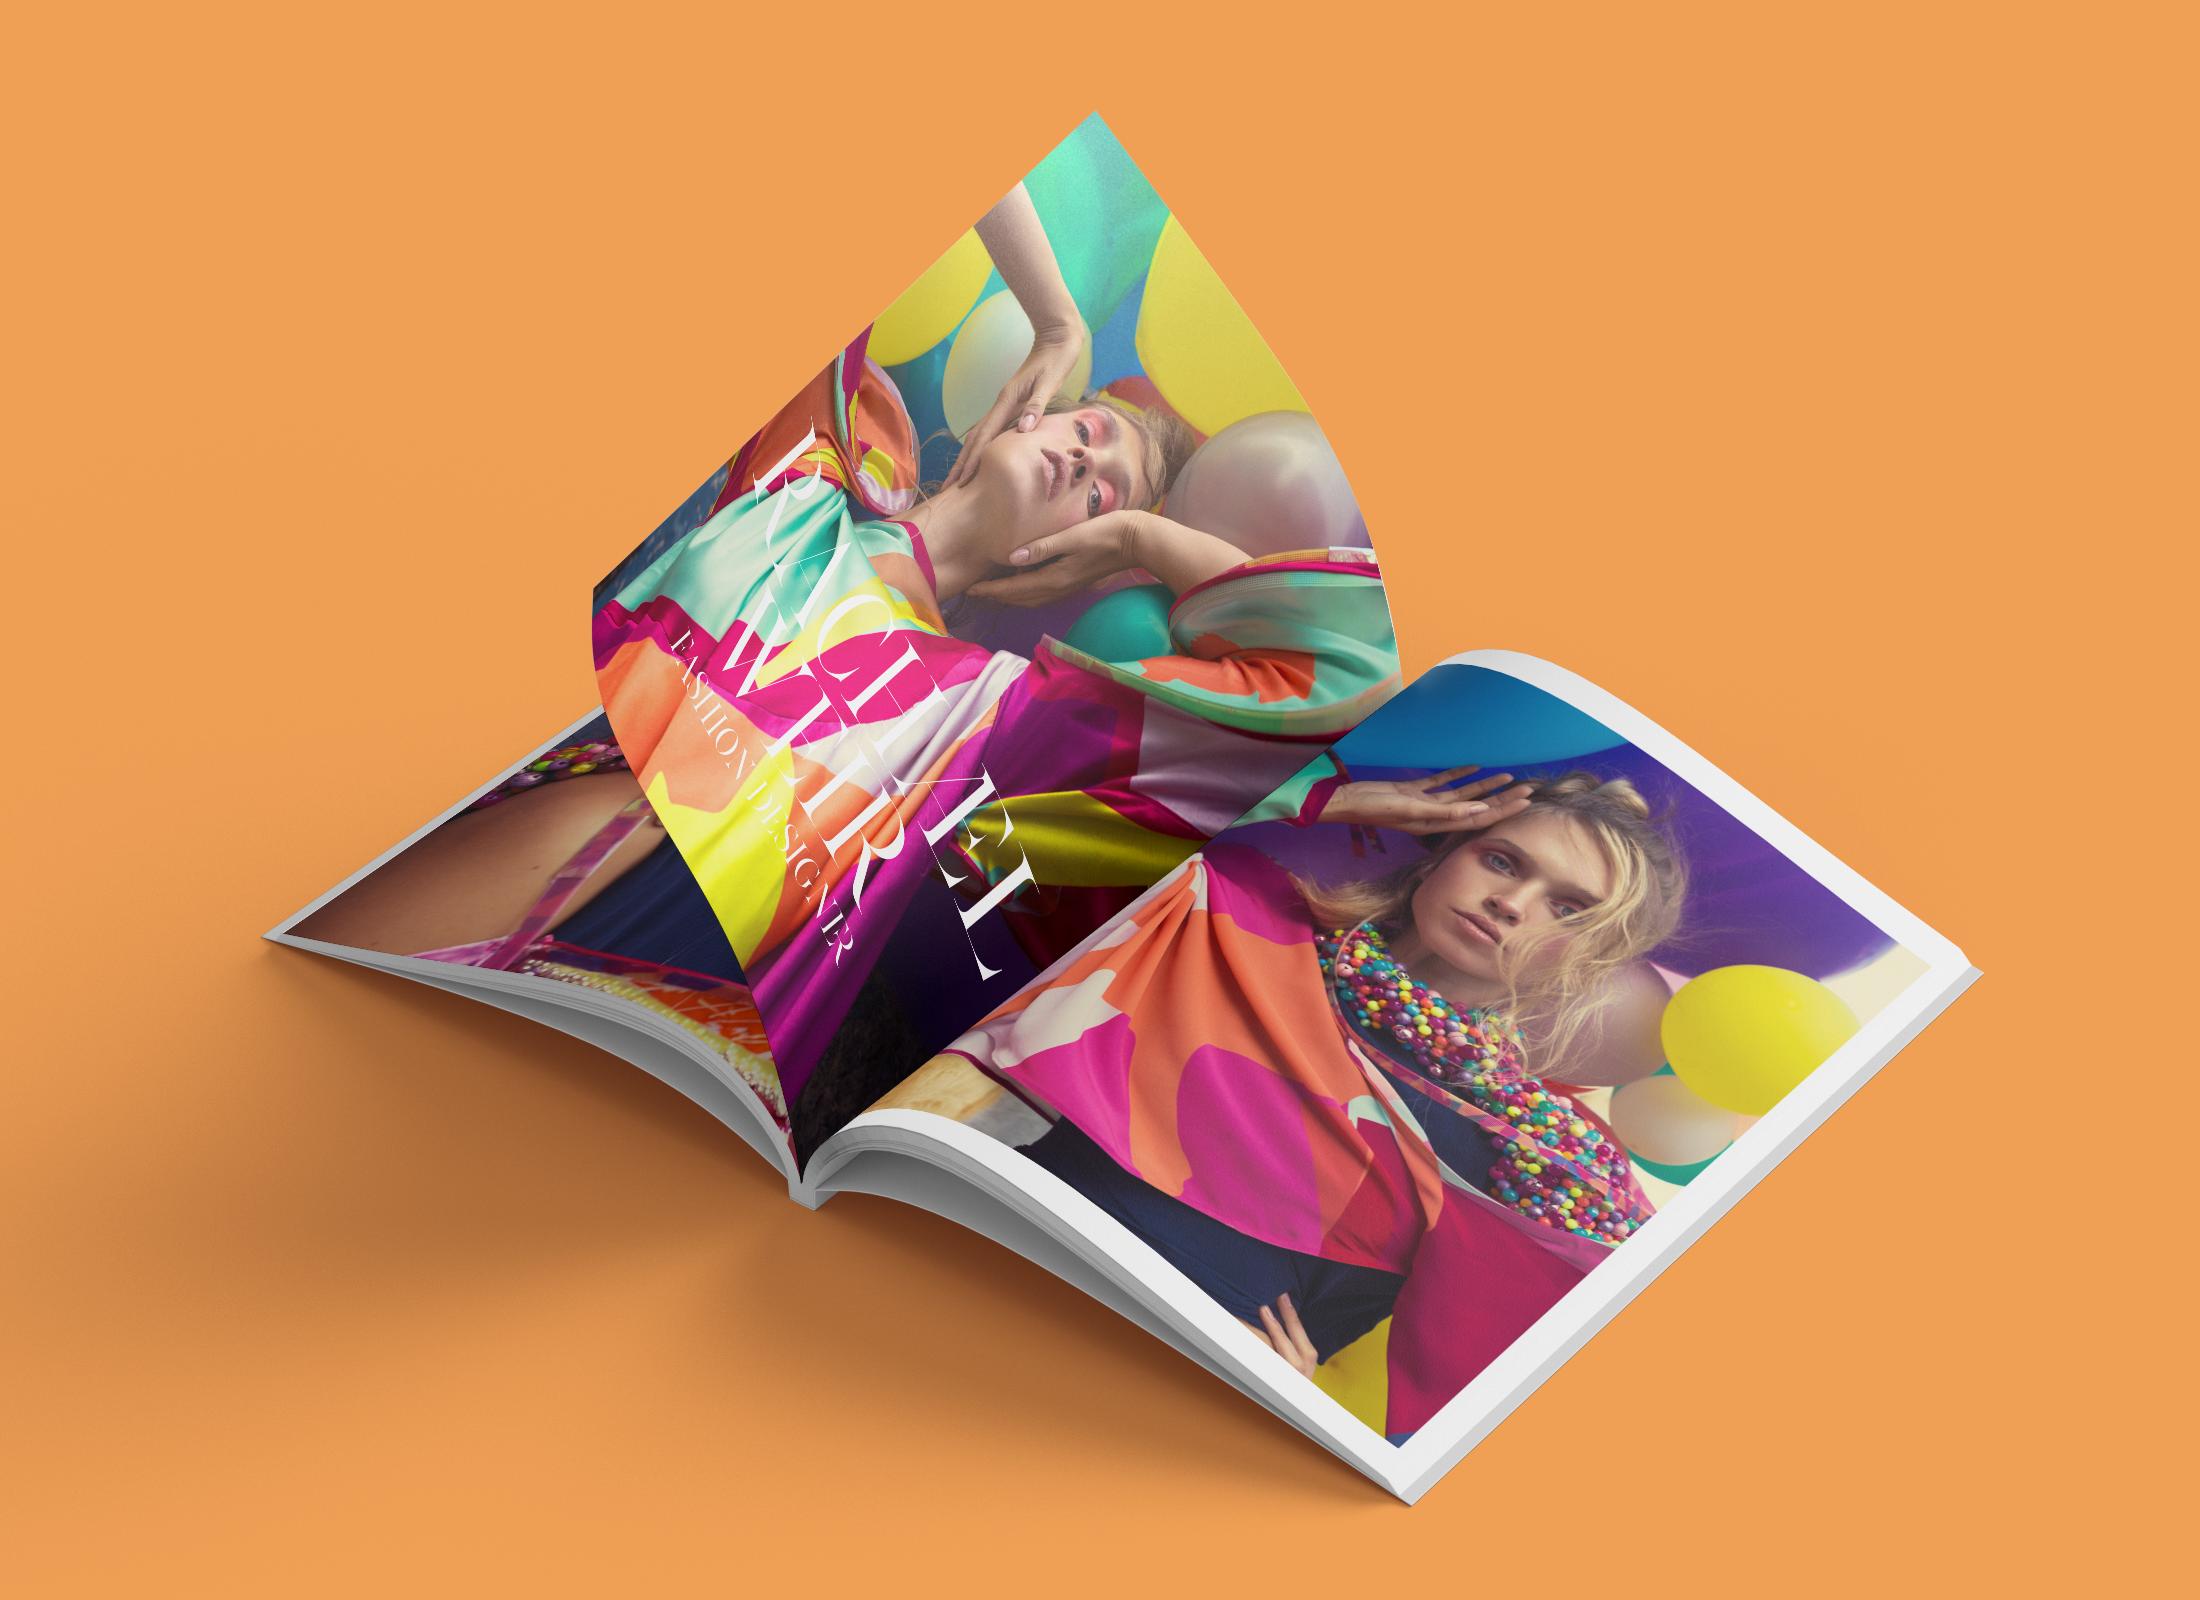 Model Citizen Magazine Issue 31, Macky Suson, Fashion Inclusion Now5.png